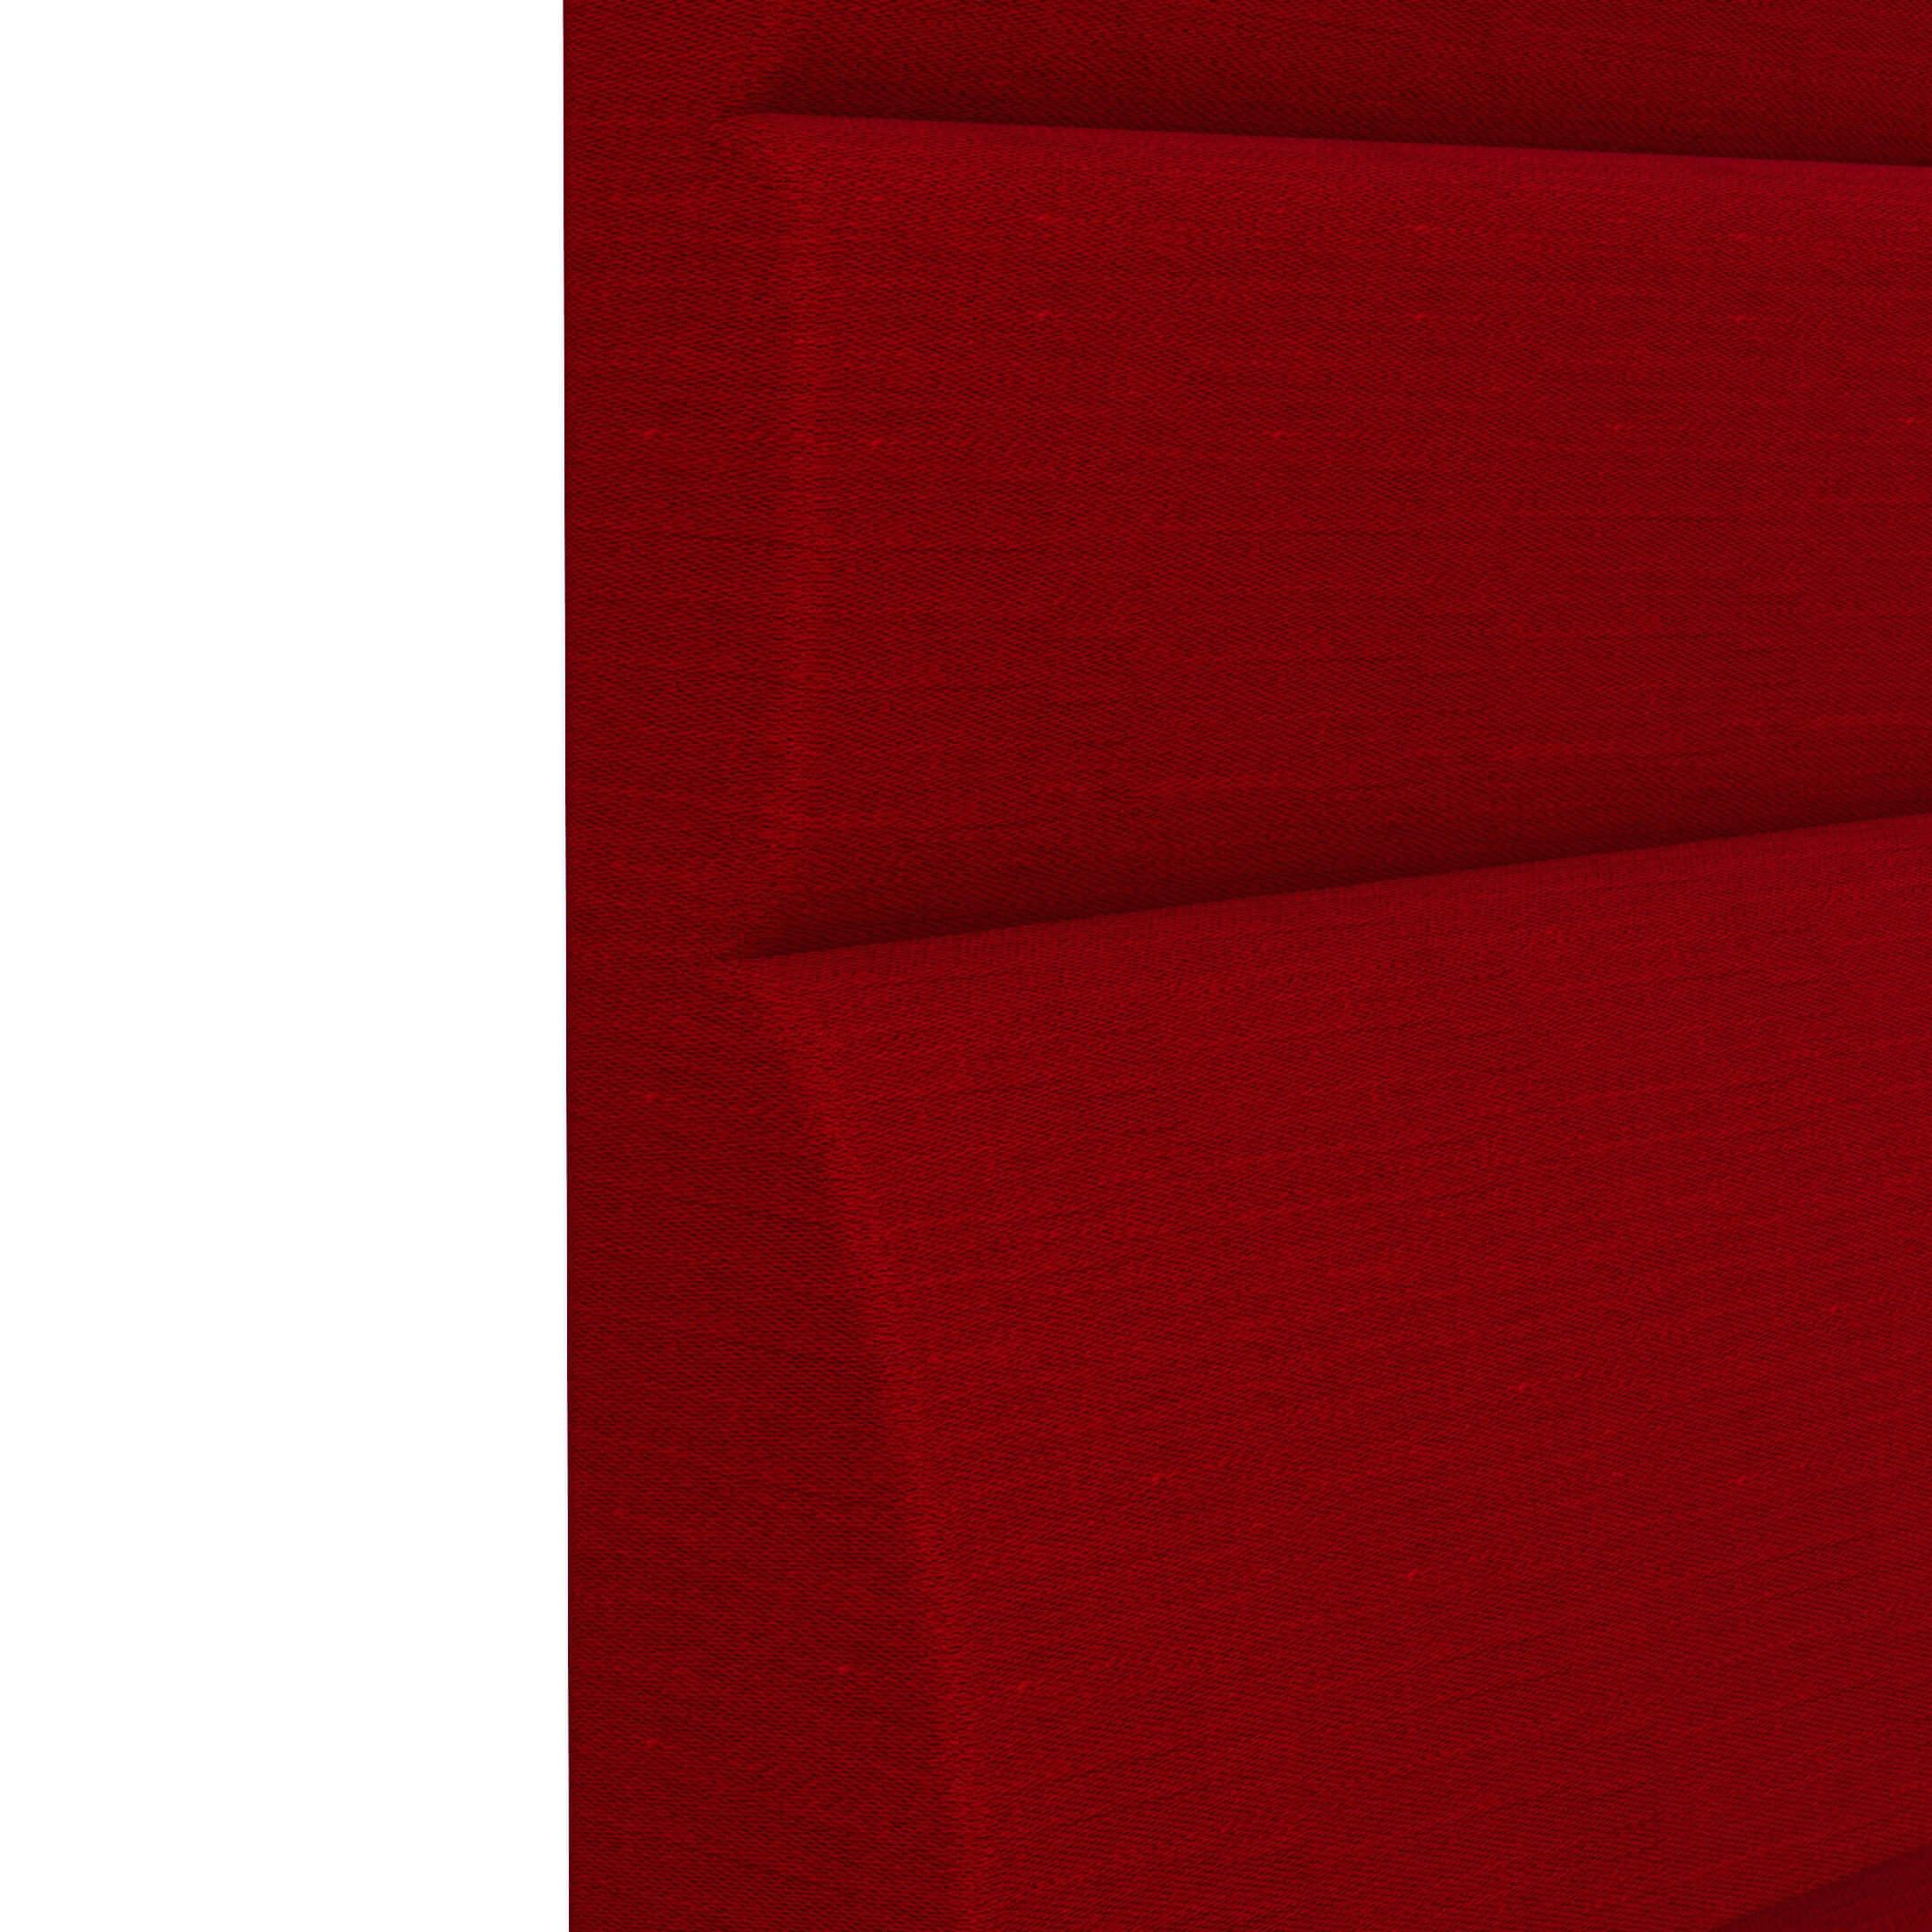 RED MELANGE_HIGH BACK BENCH FABRICS